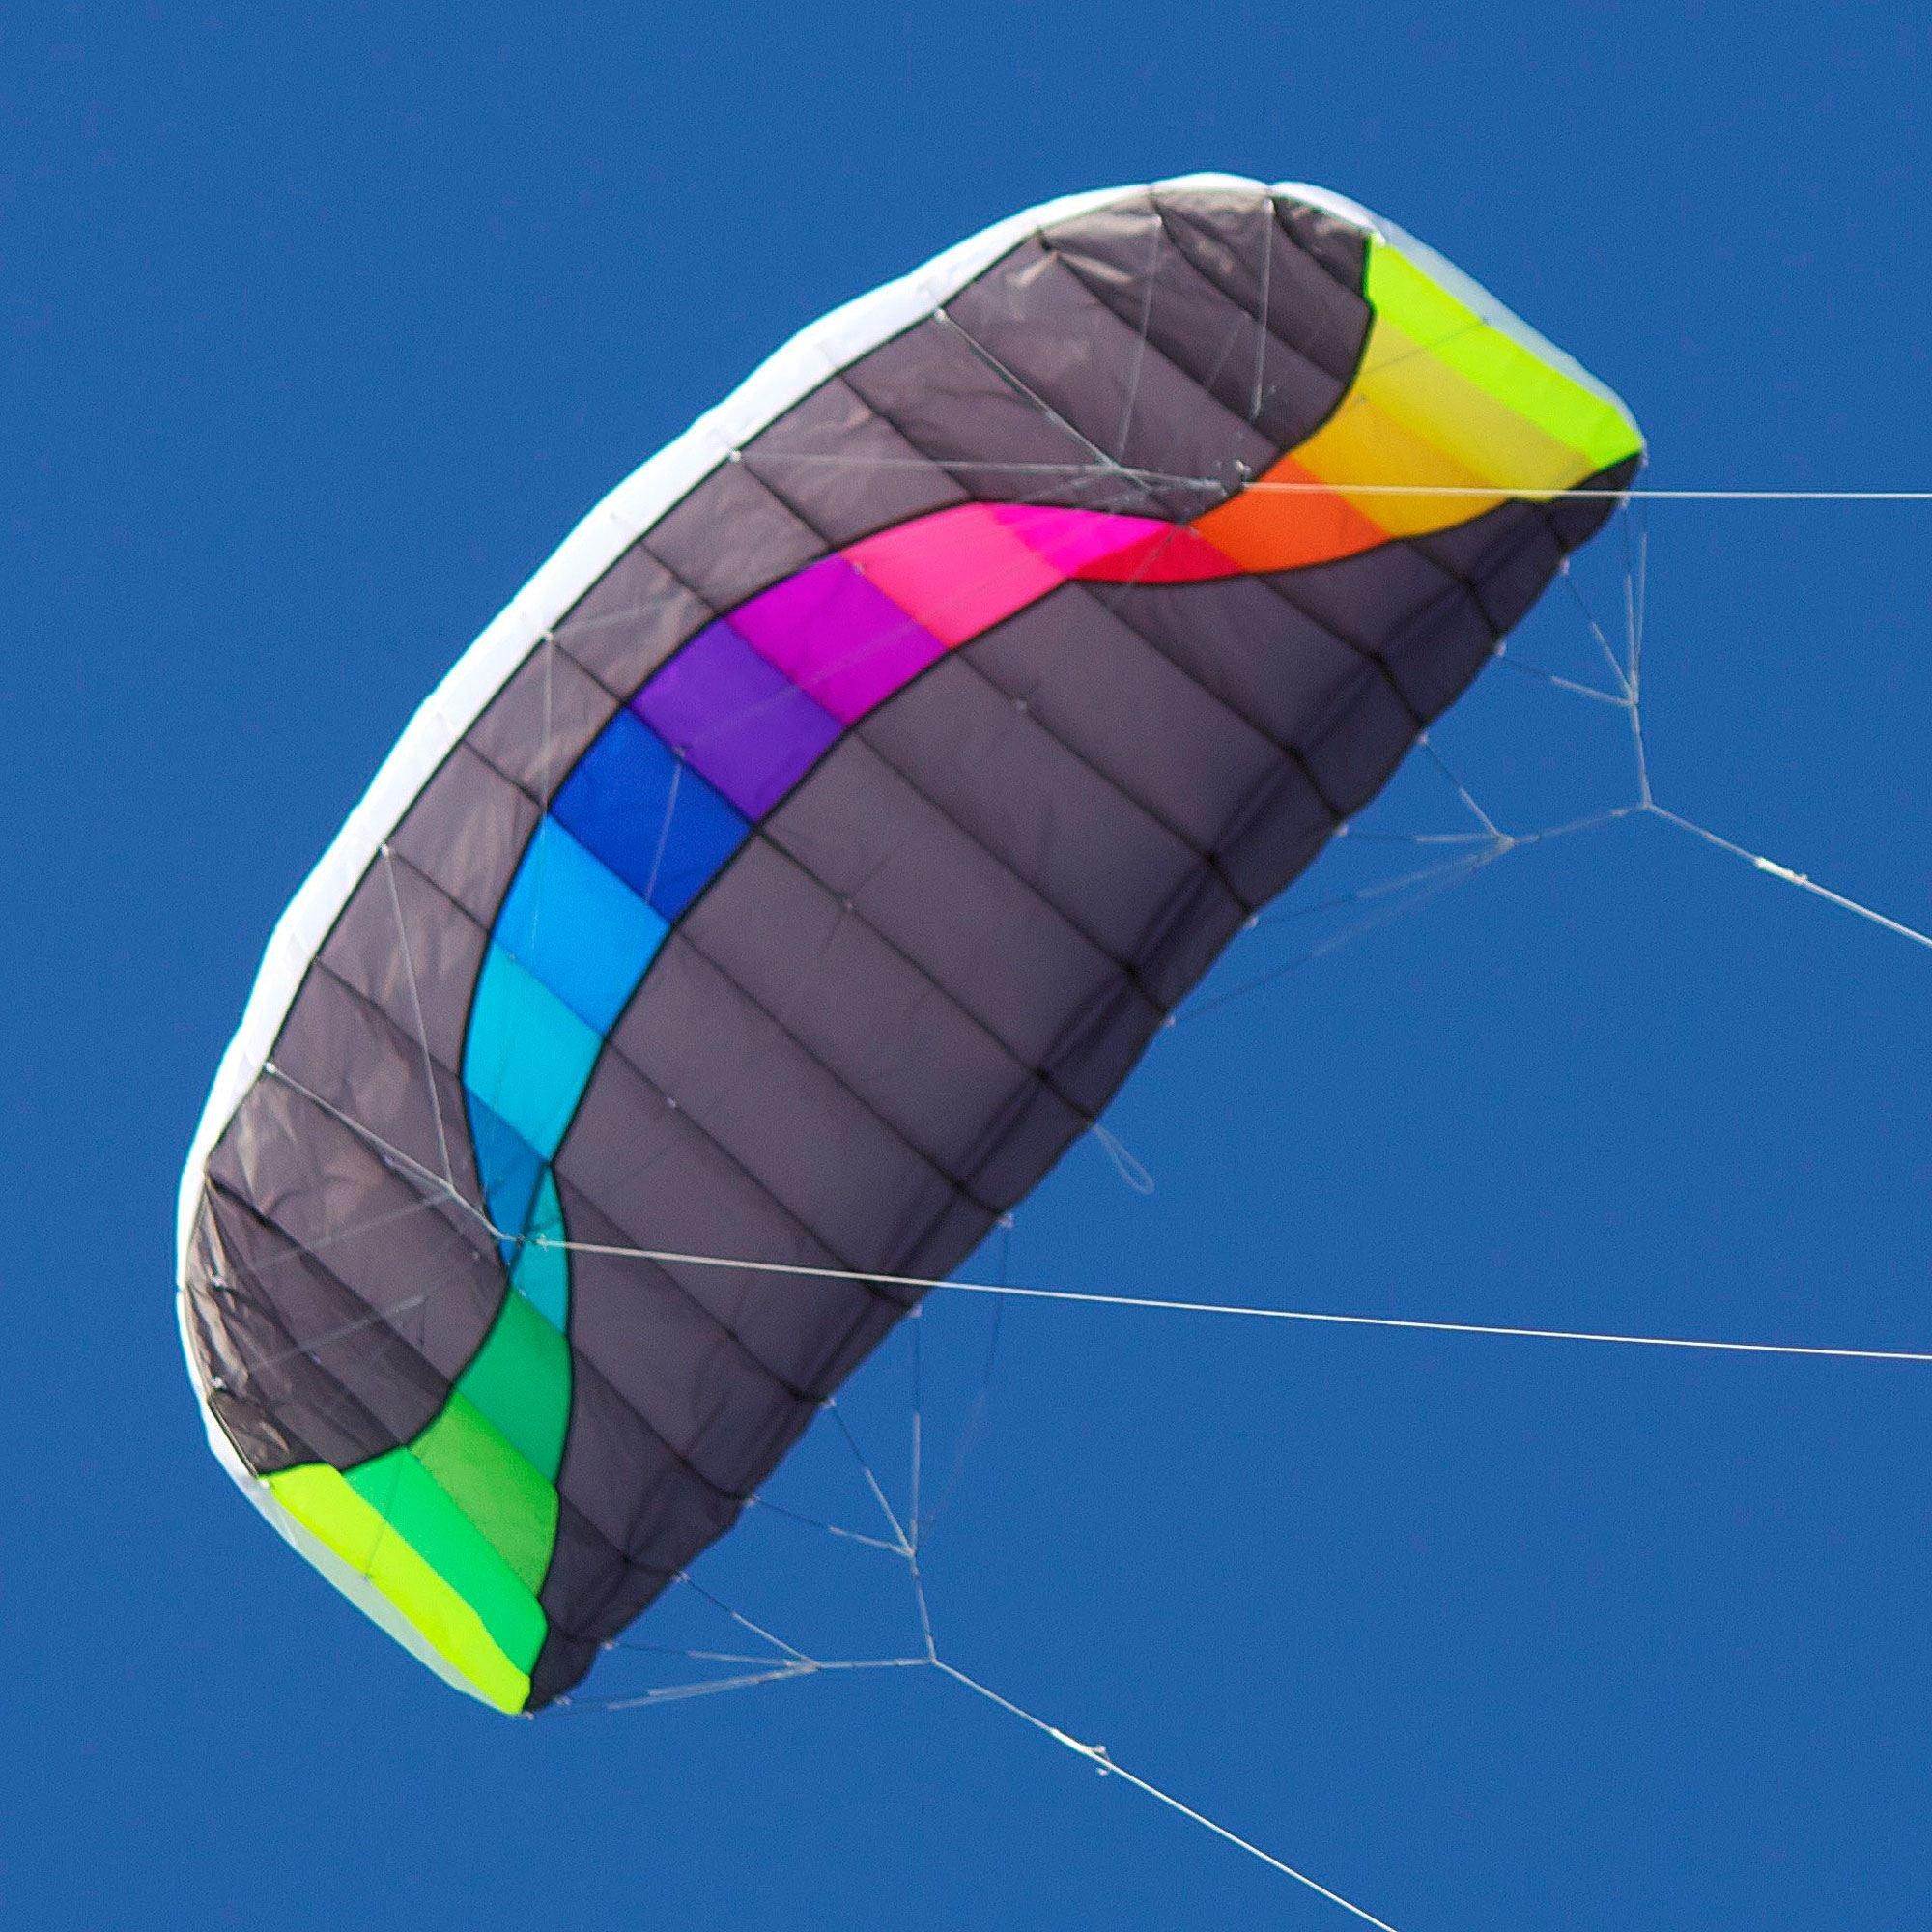 Sundog Quad Line Stunt Kite by Into The Wind